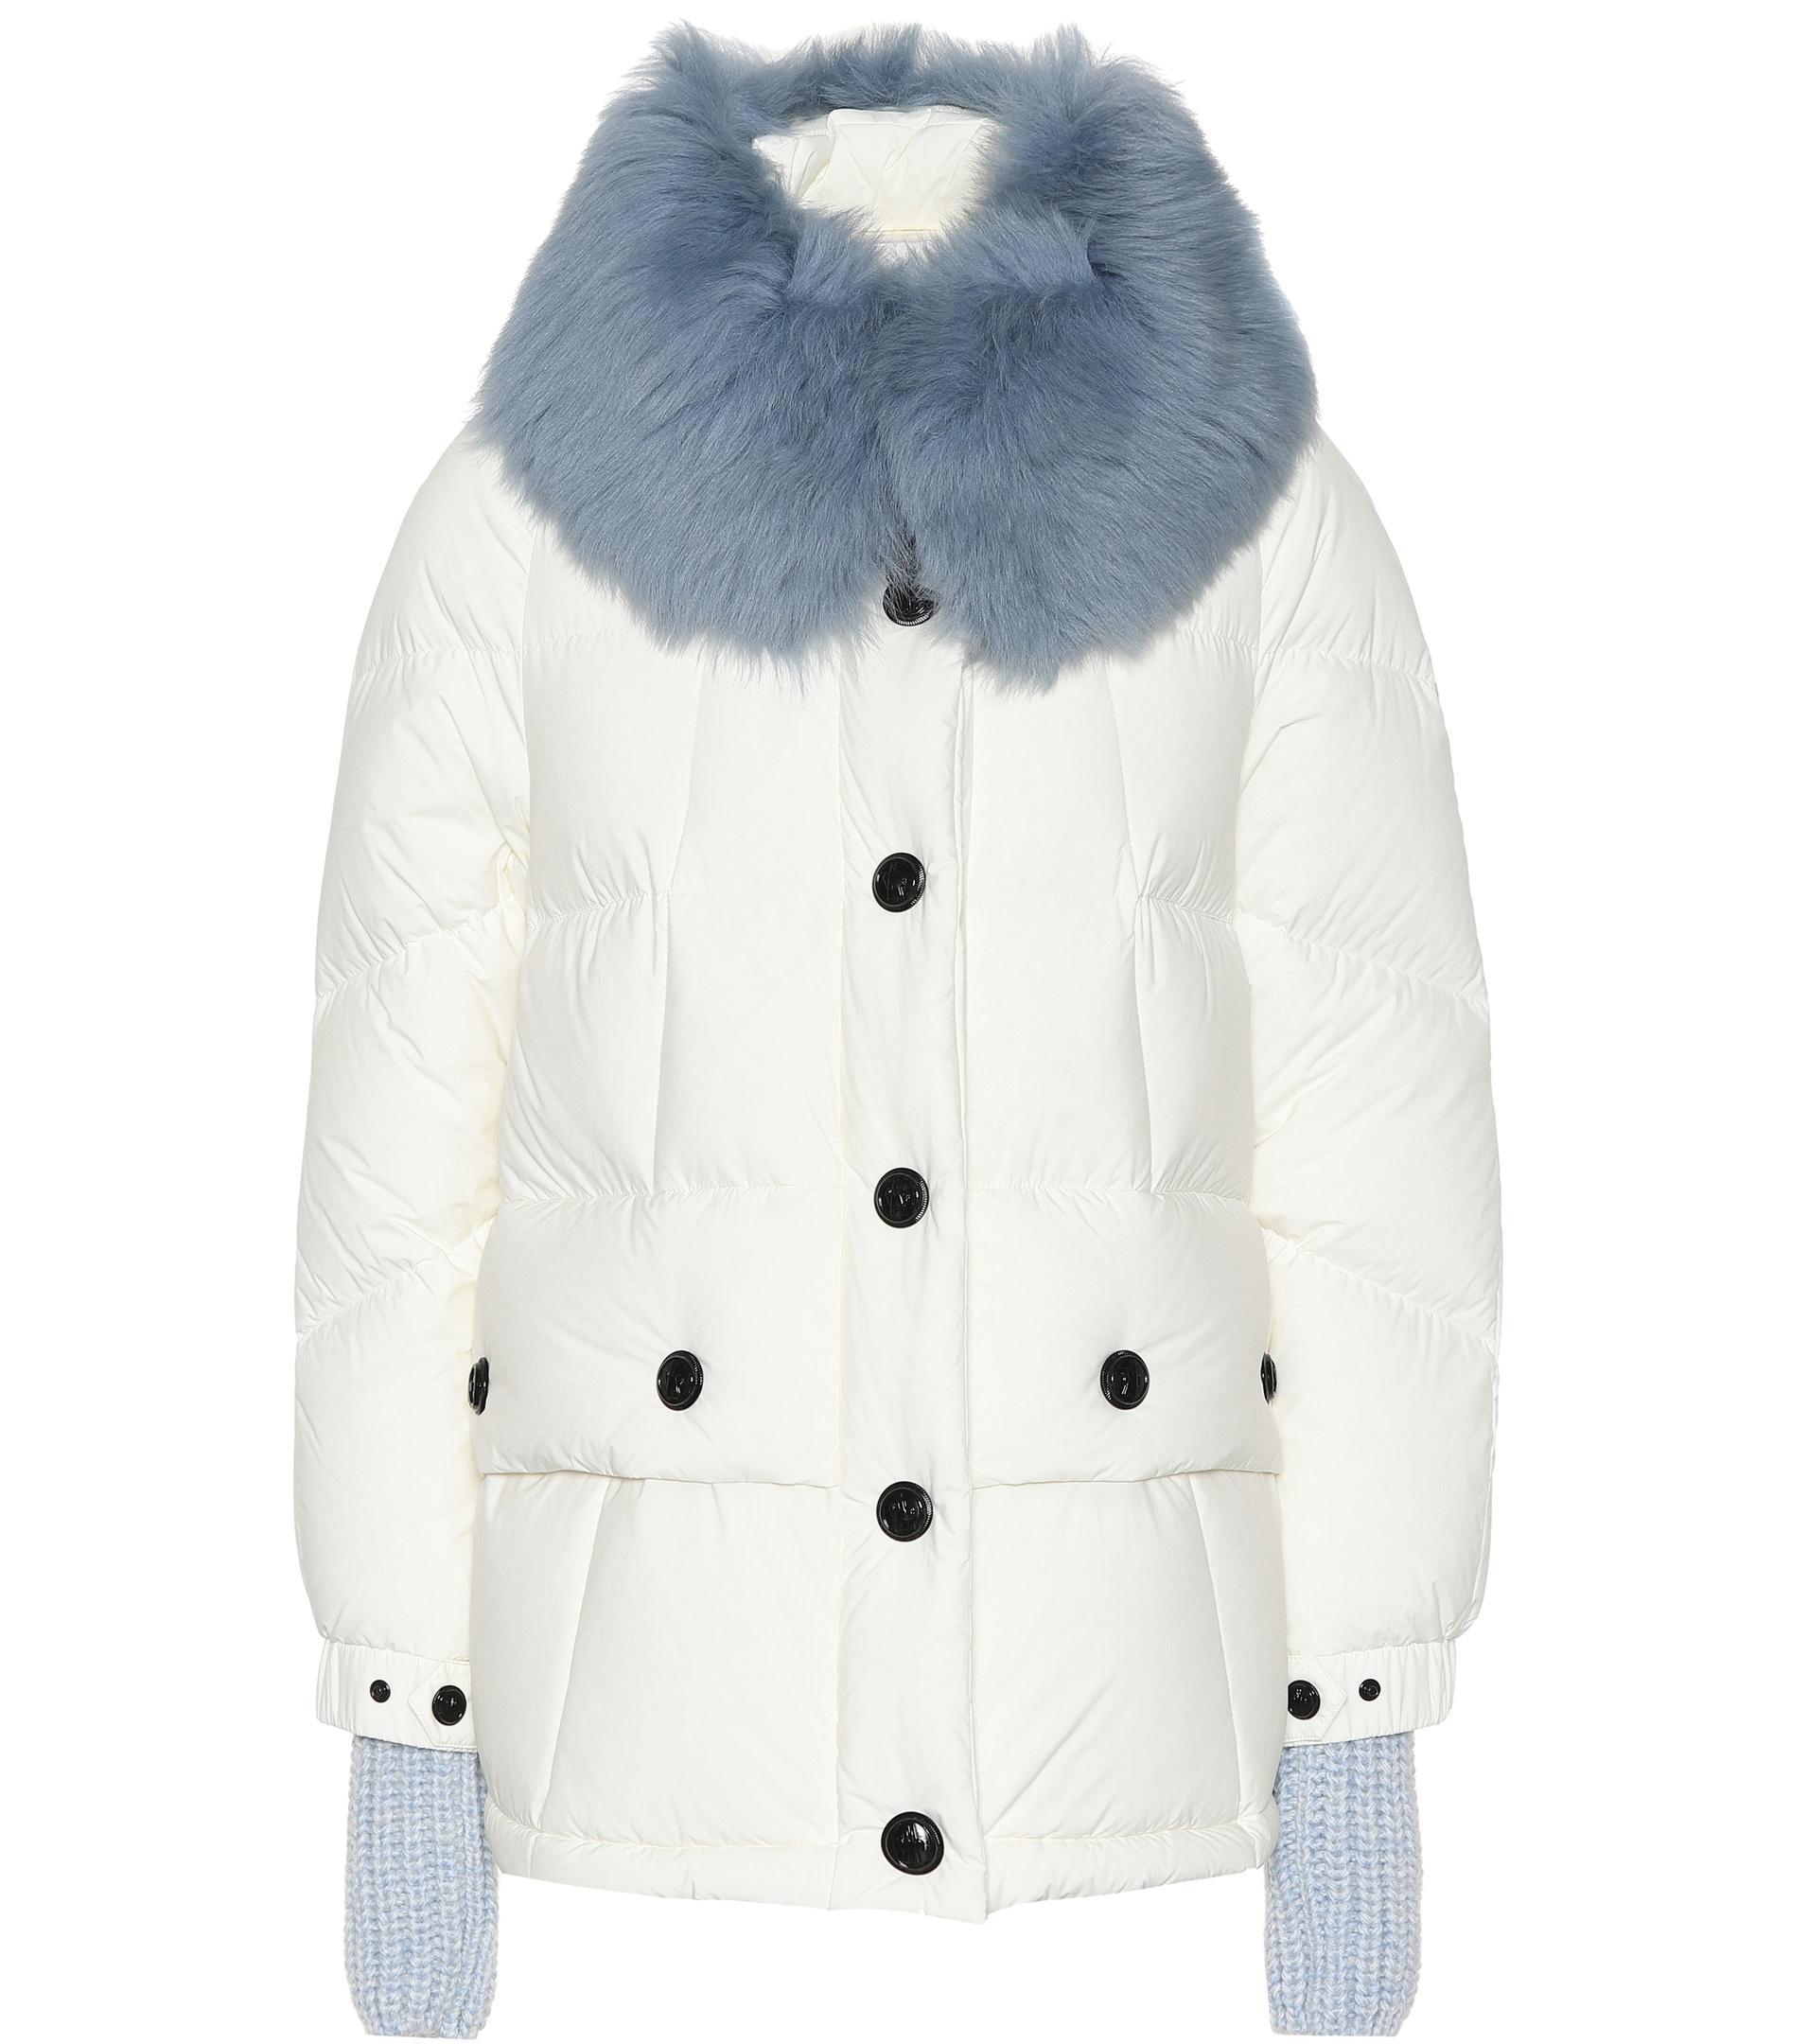 76e53c86ba2e Lyst - Moncler Grenoble Carezza Down Ski Jacket in White